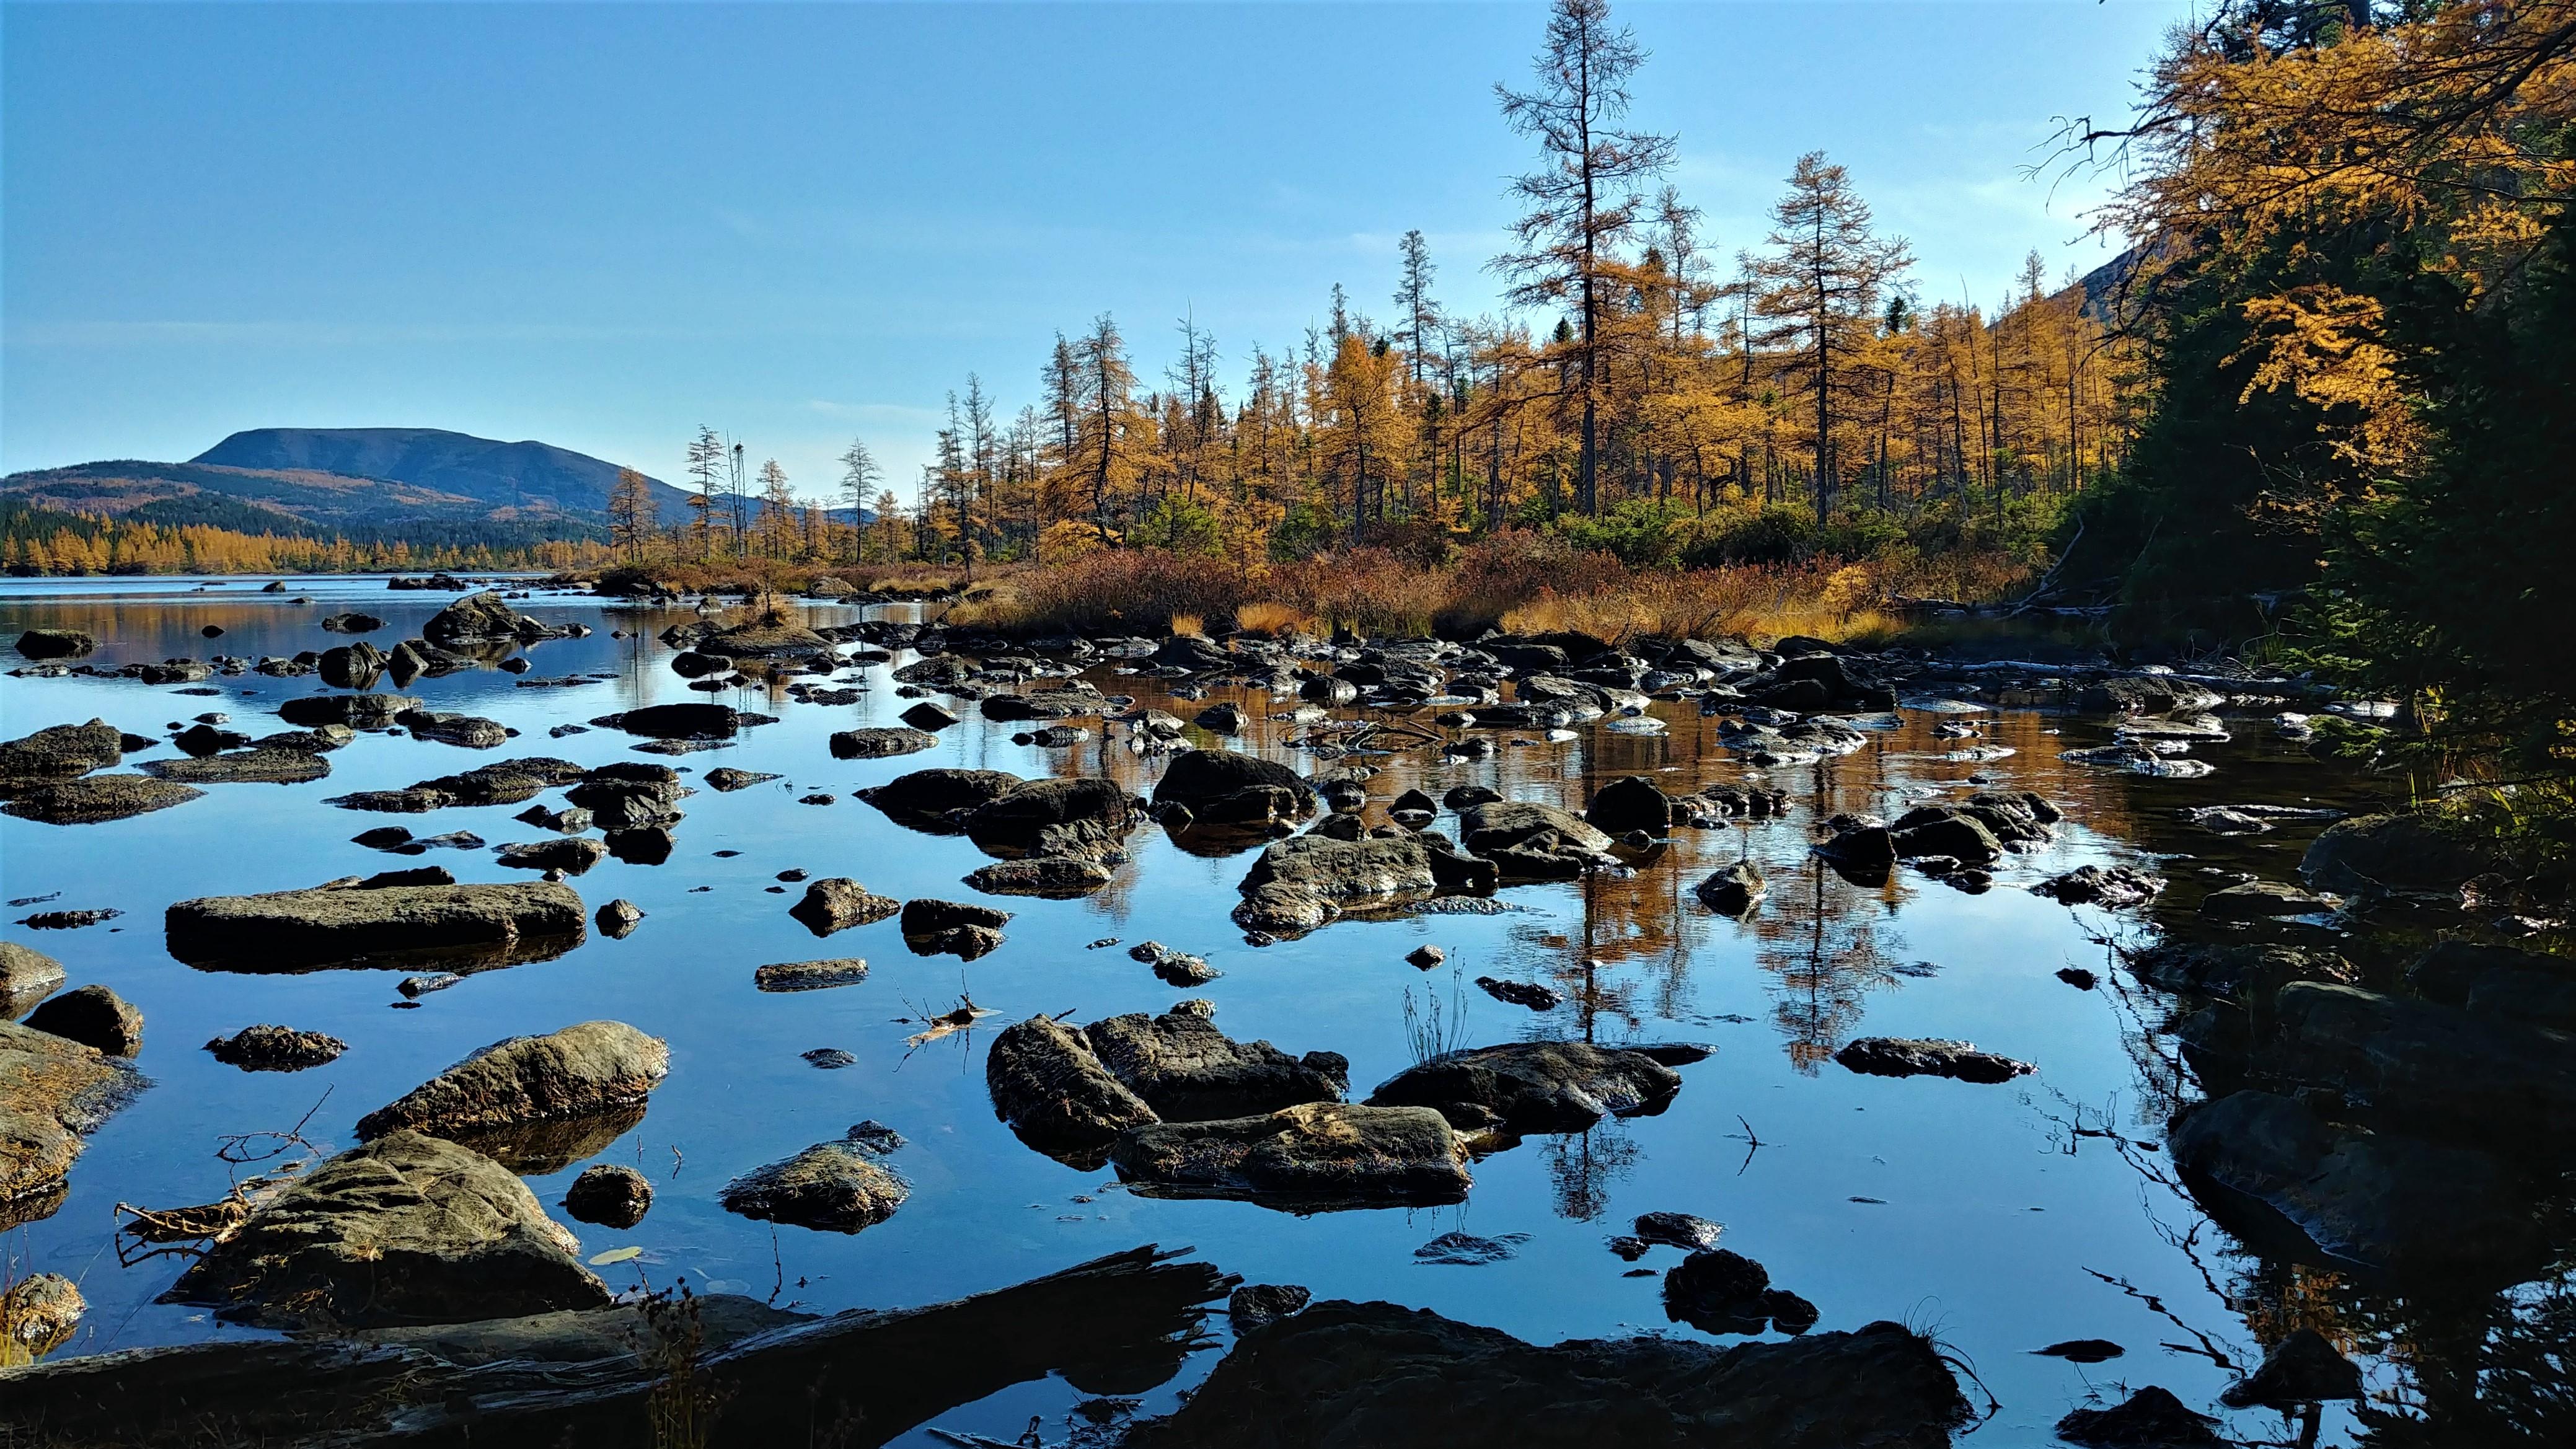 lac abri serpentine mont albert parc gaspesie automne randonnee blog voyage quebec arpenter le chemin